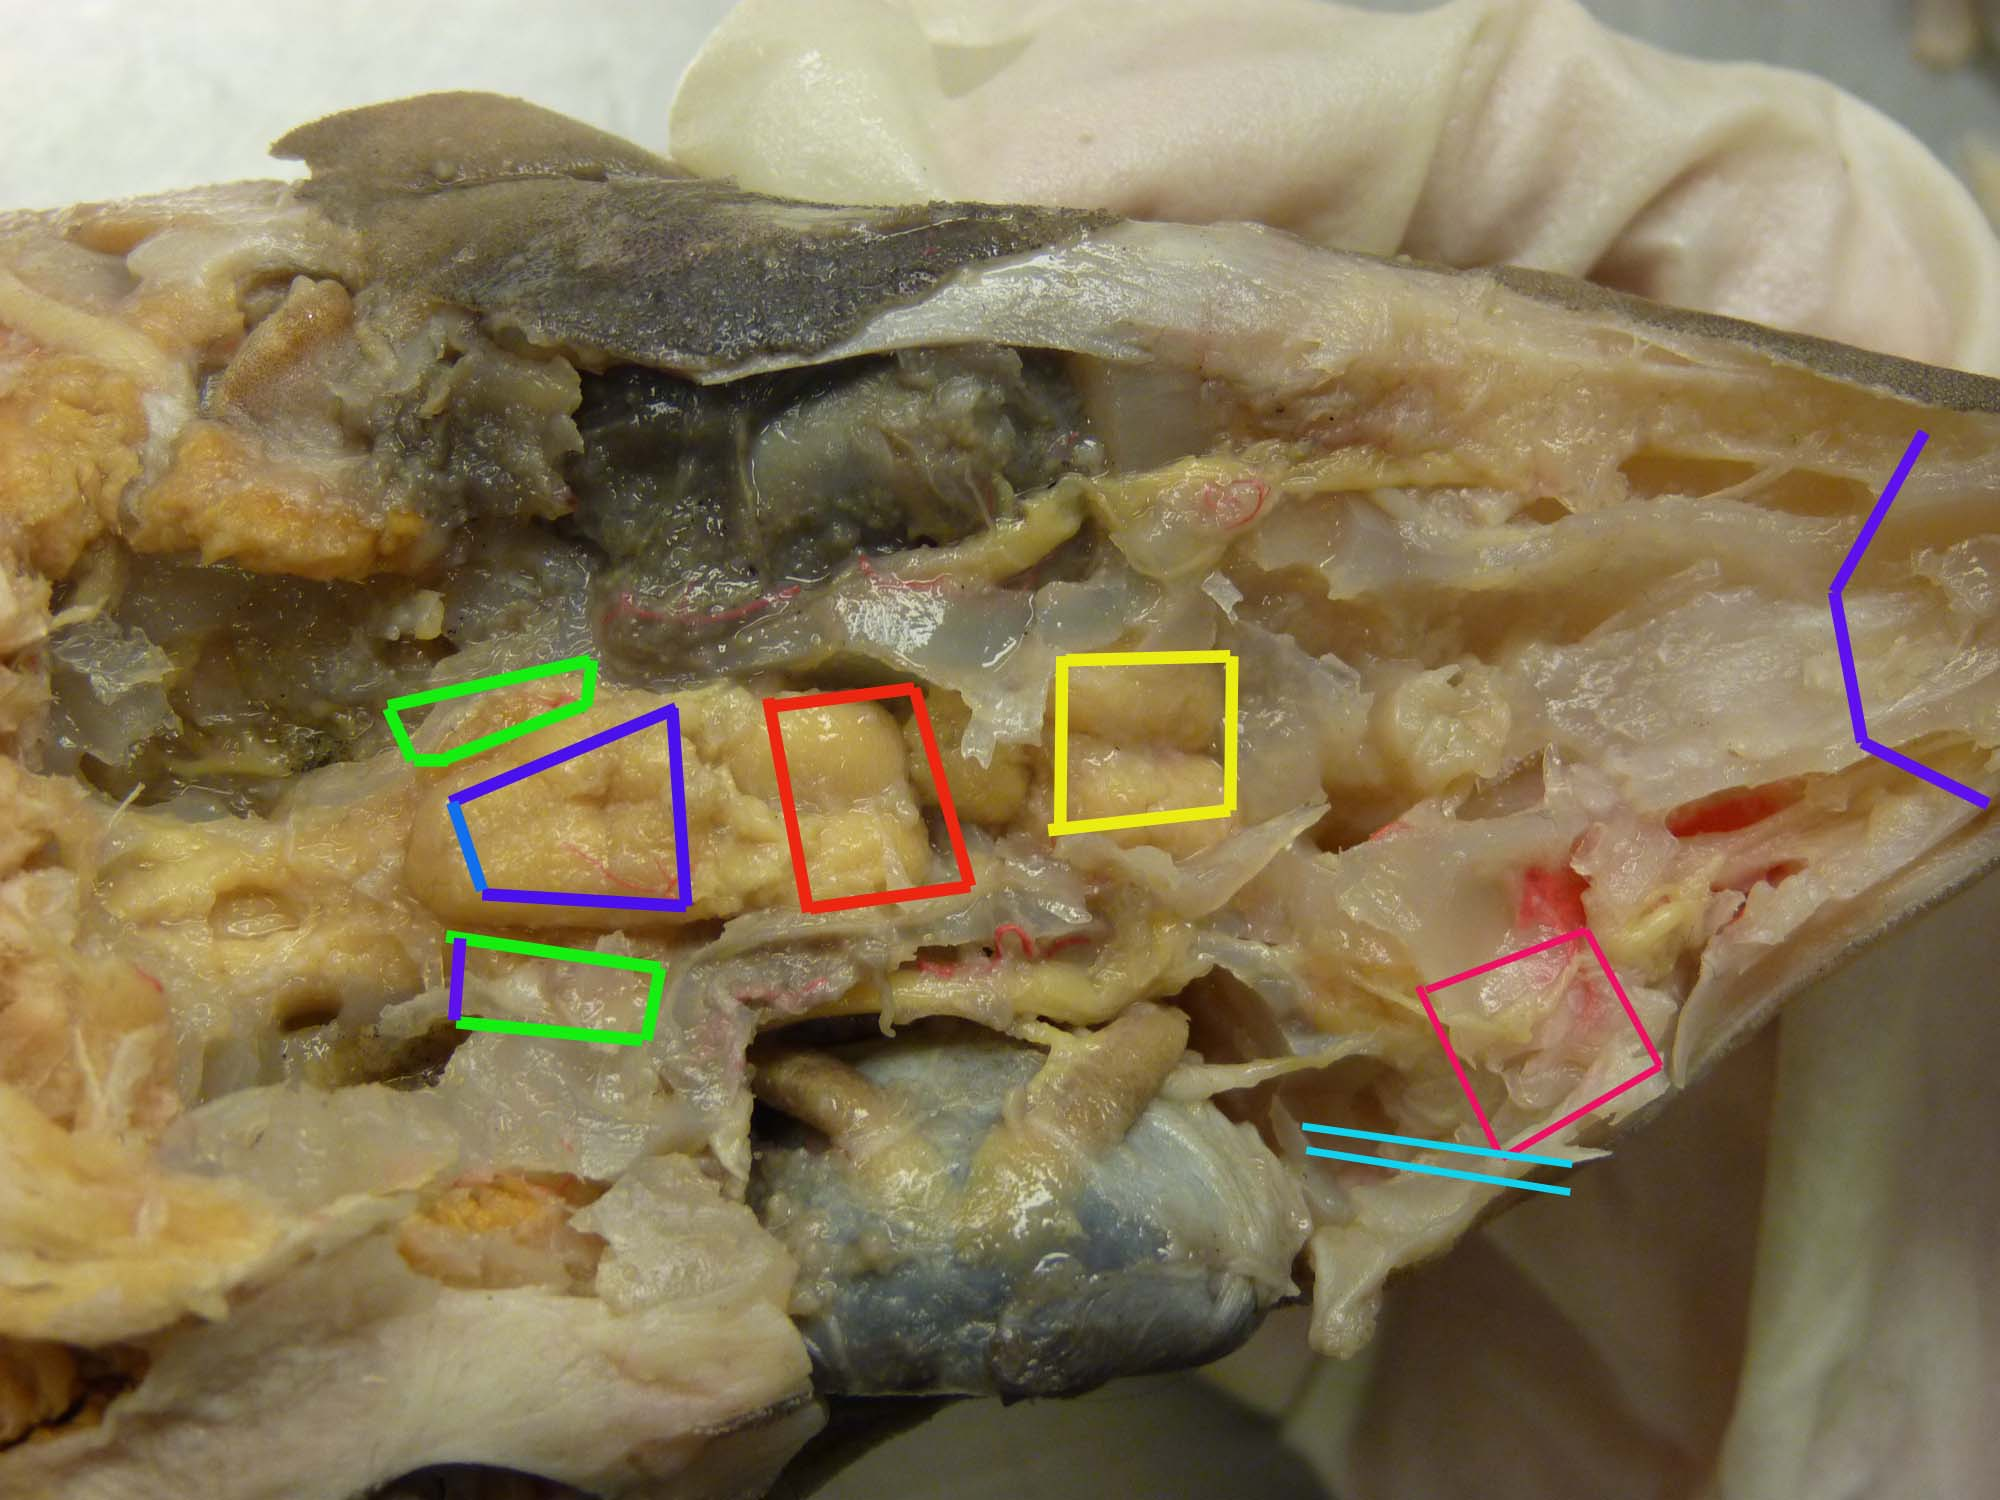 Shark Internal Anatomy Quiz